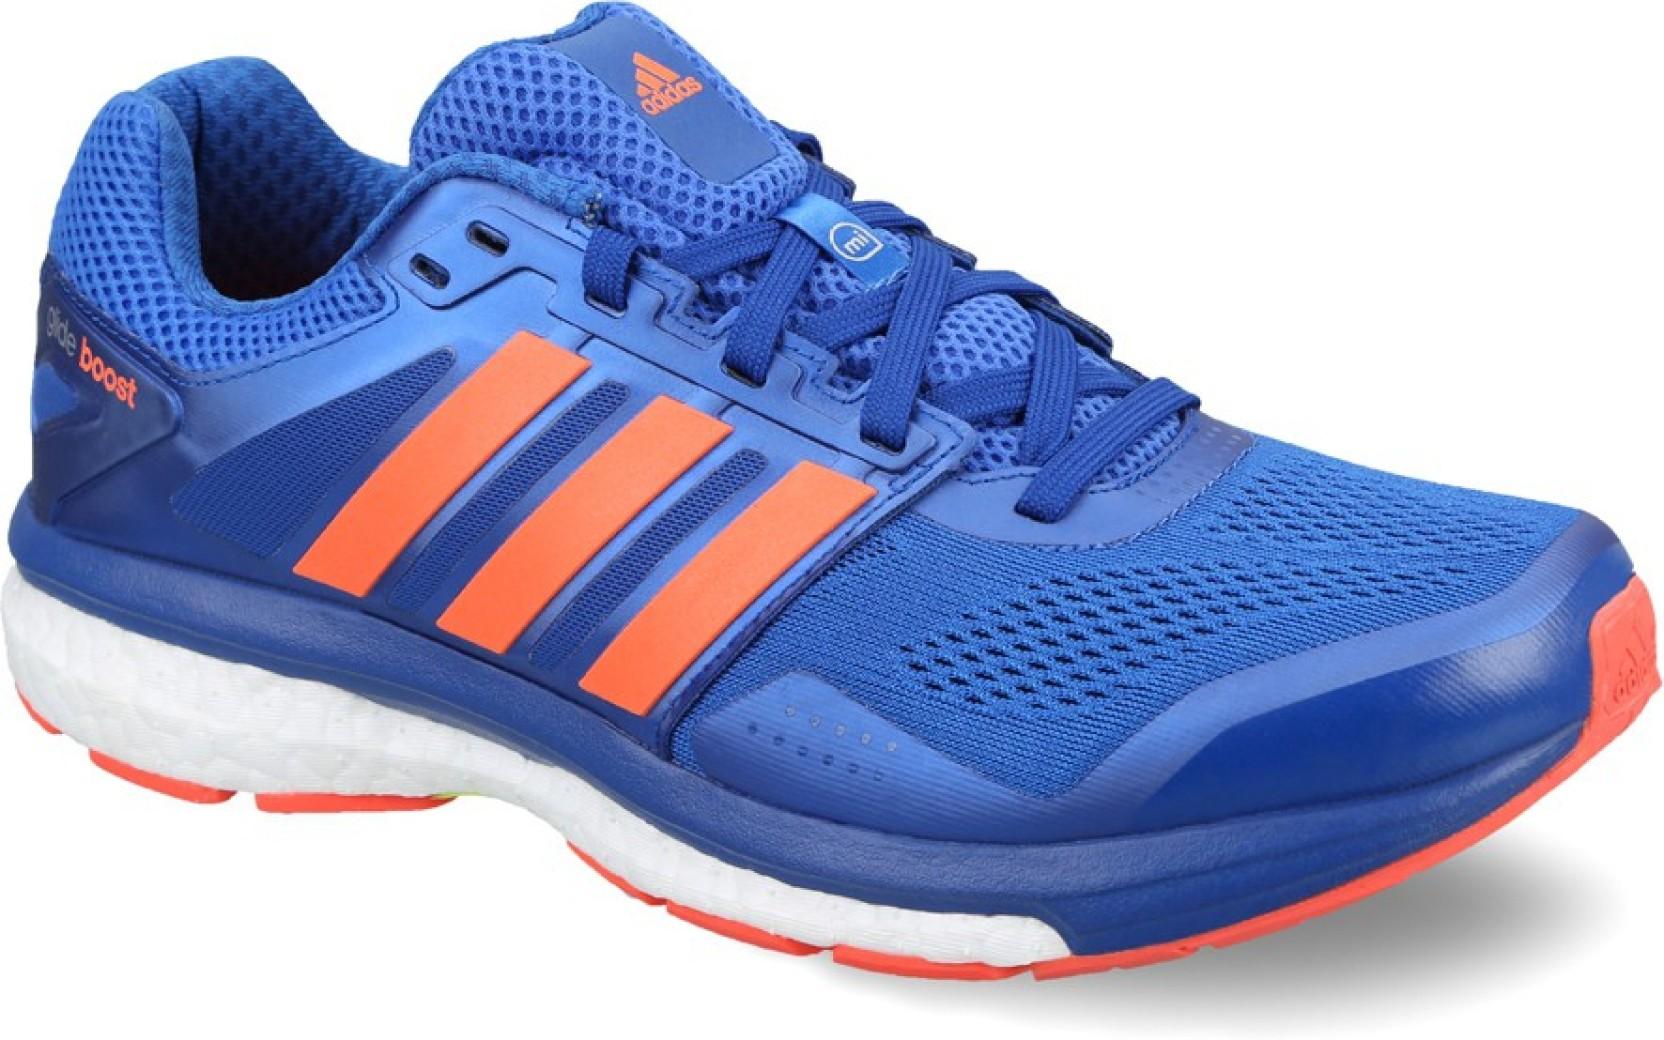 7bf0daedb4ec7 ADIDAS Supernova Glide Boost 7 M Running Shoes For Men - Buy Blue ...